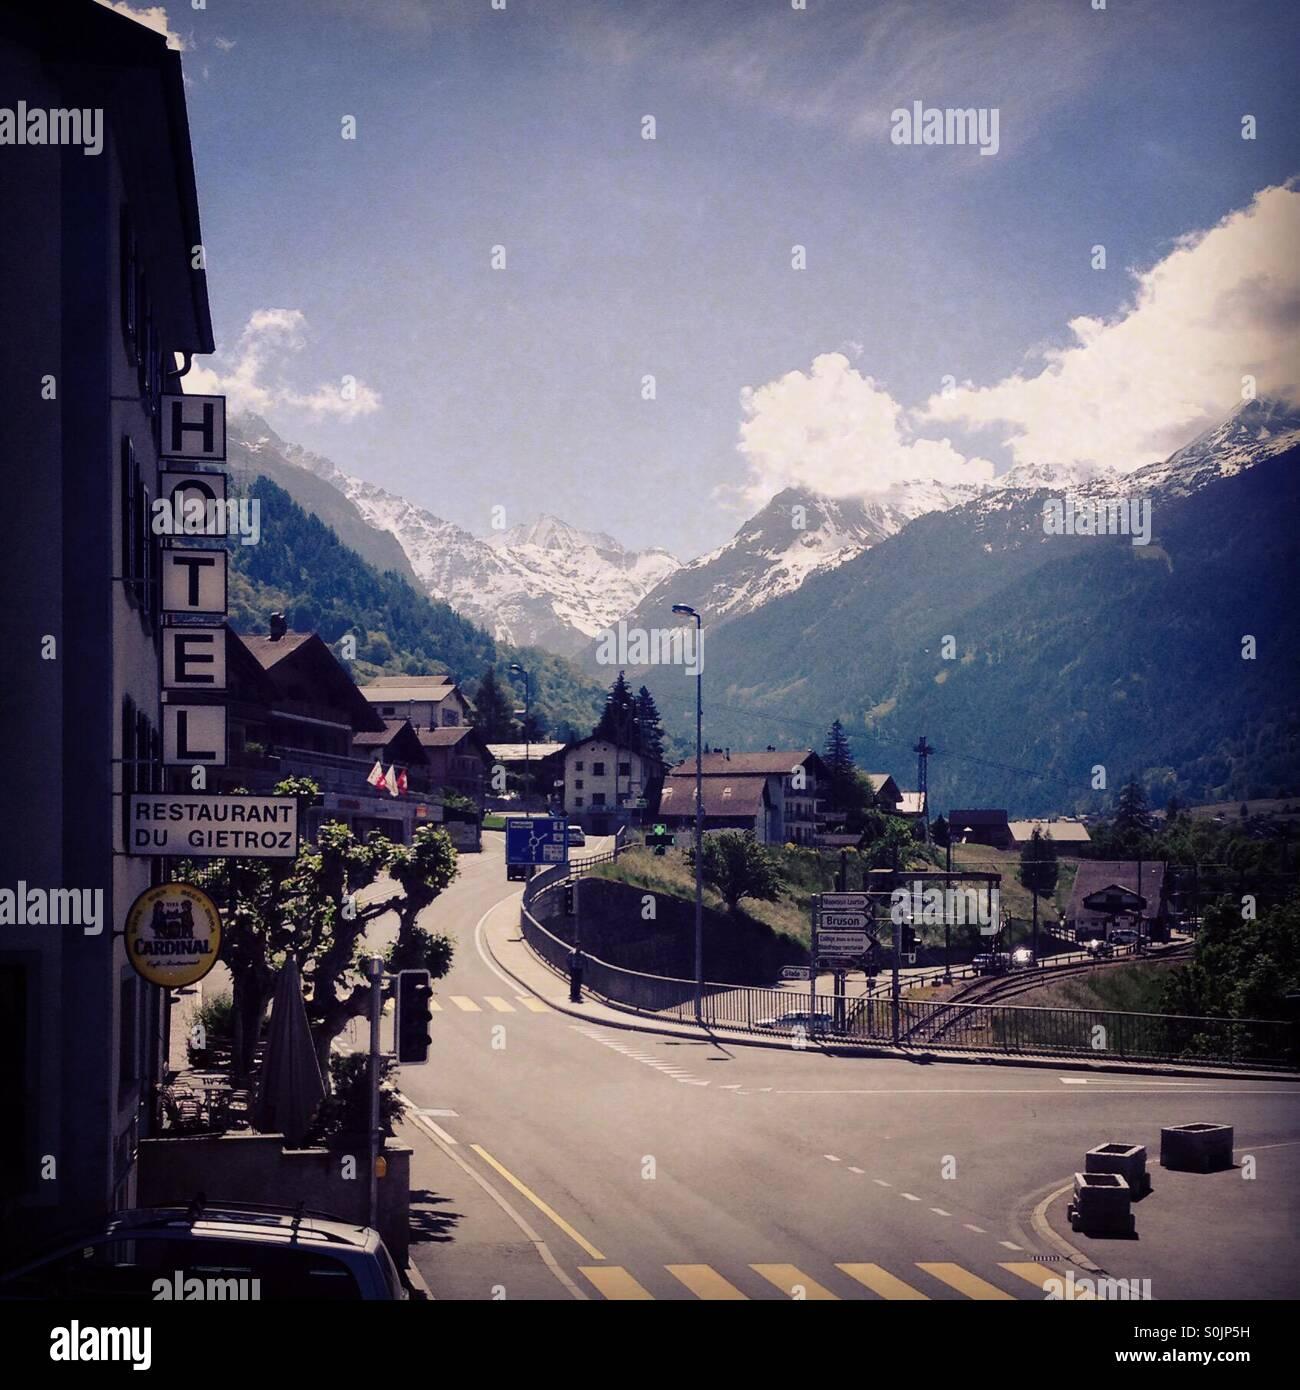 Vernier Switzerland 2014 - Stock Image